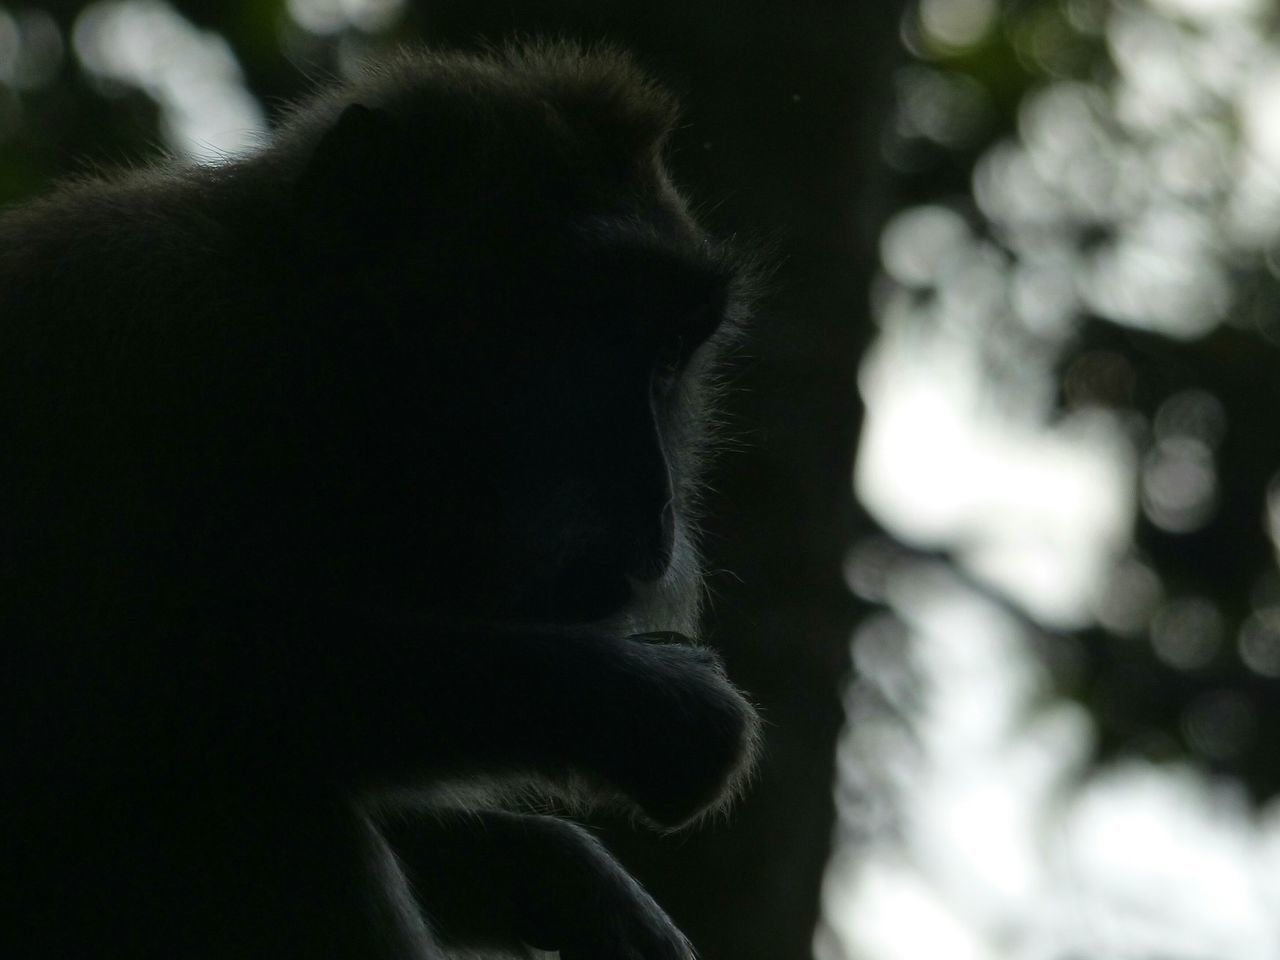 Black Color Monkey Beauty In Nature INDONESIA Bali Ubud Monkey Forest Animal Themes Nature Animal Wildlife One Animal Dark Shadow